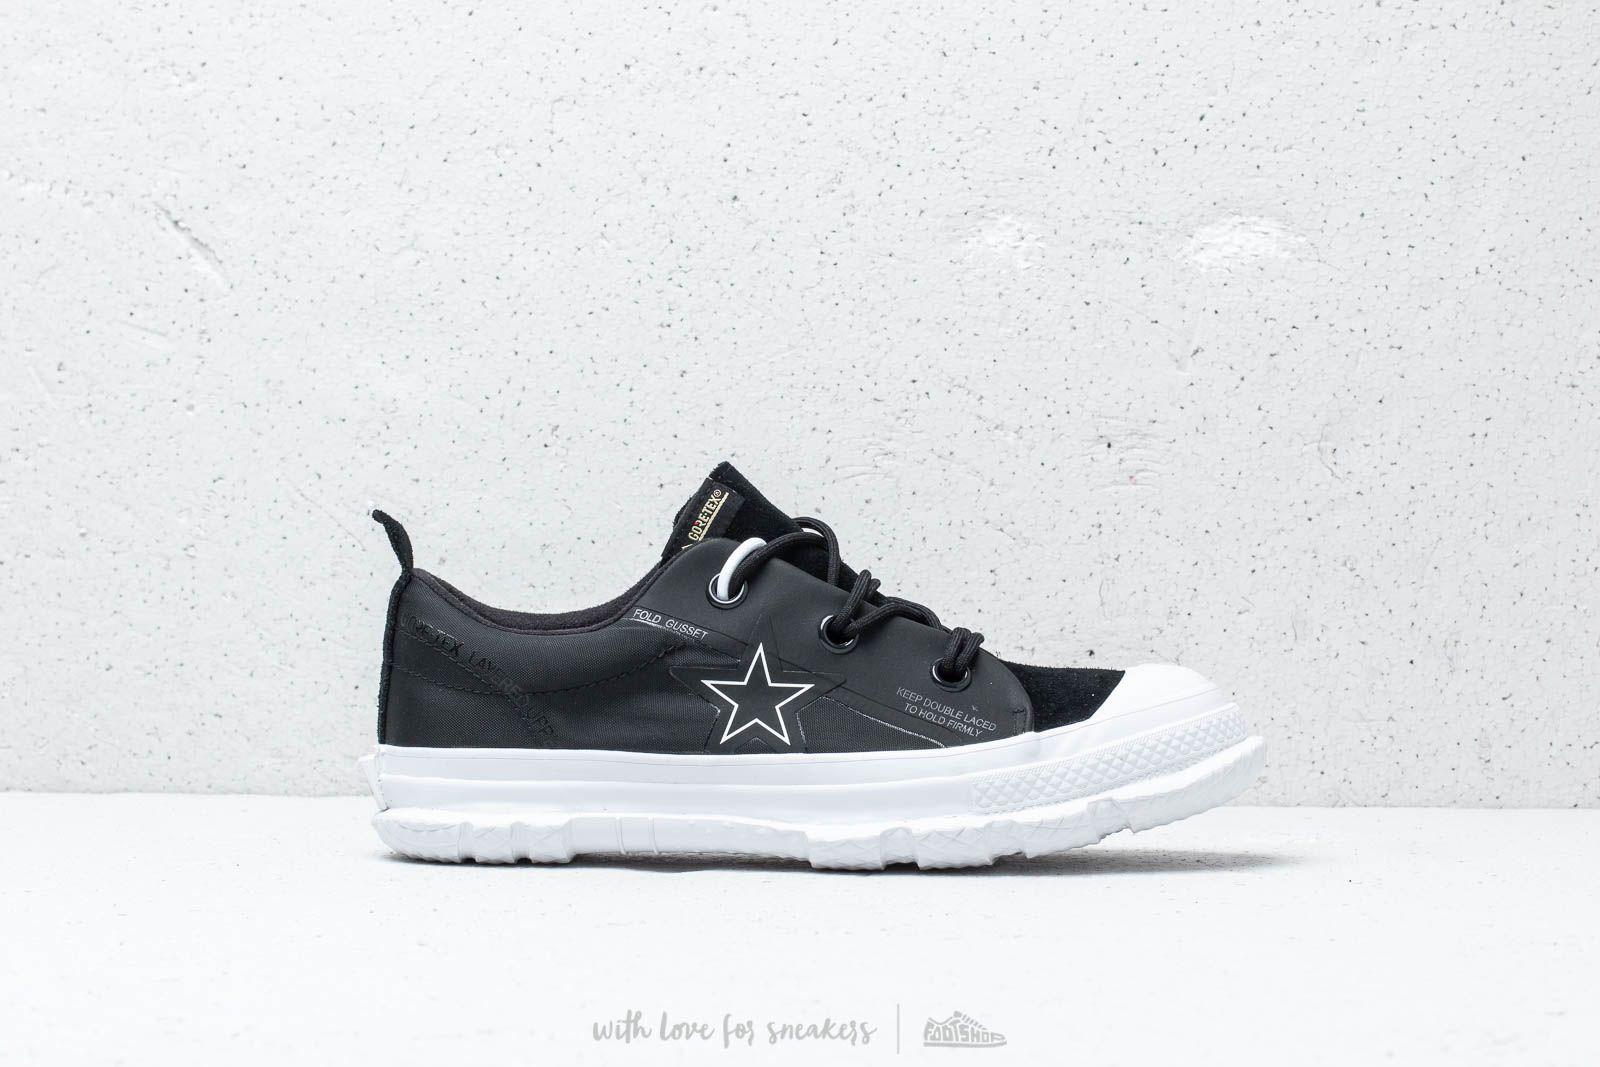 a9e51dfed5c5dc Converse One Star MC18 OX Black  White  White at a great price 139 €